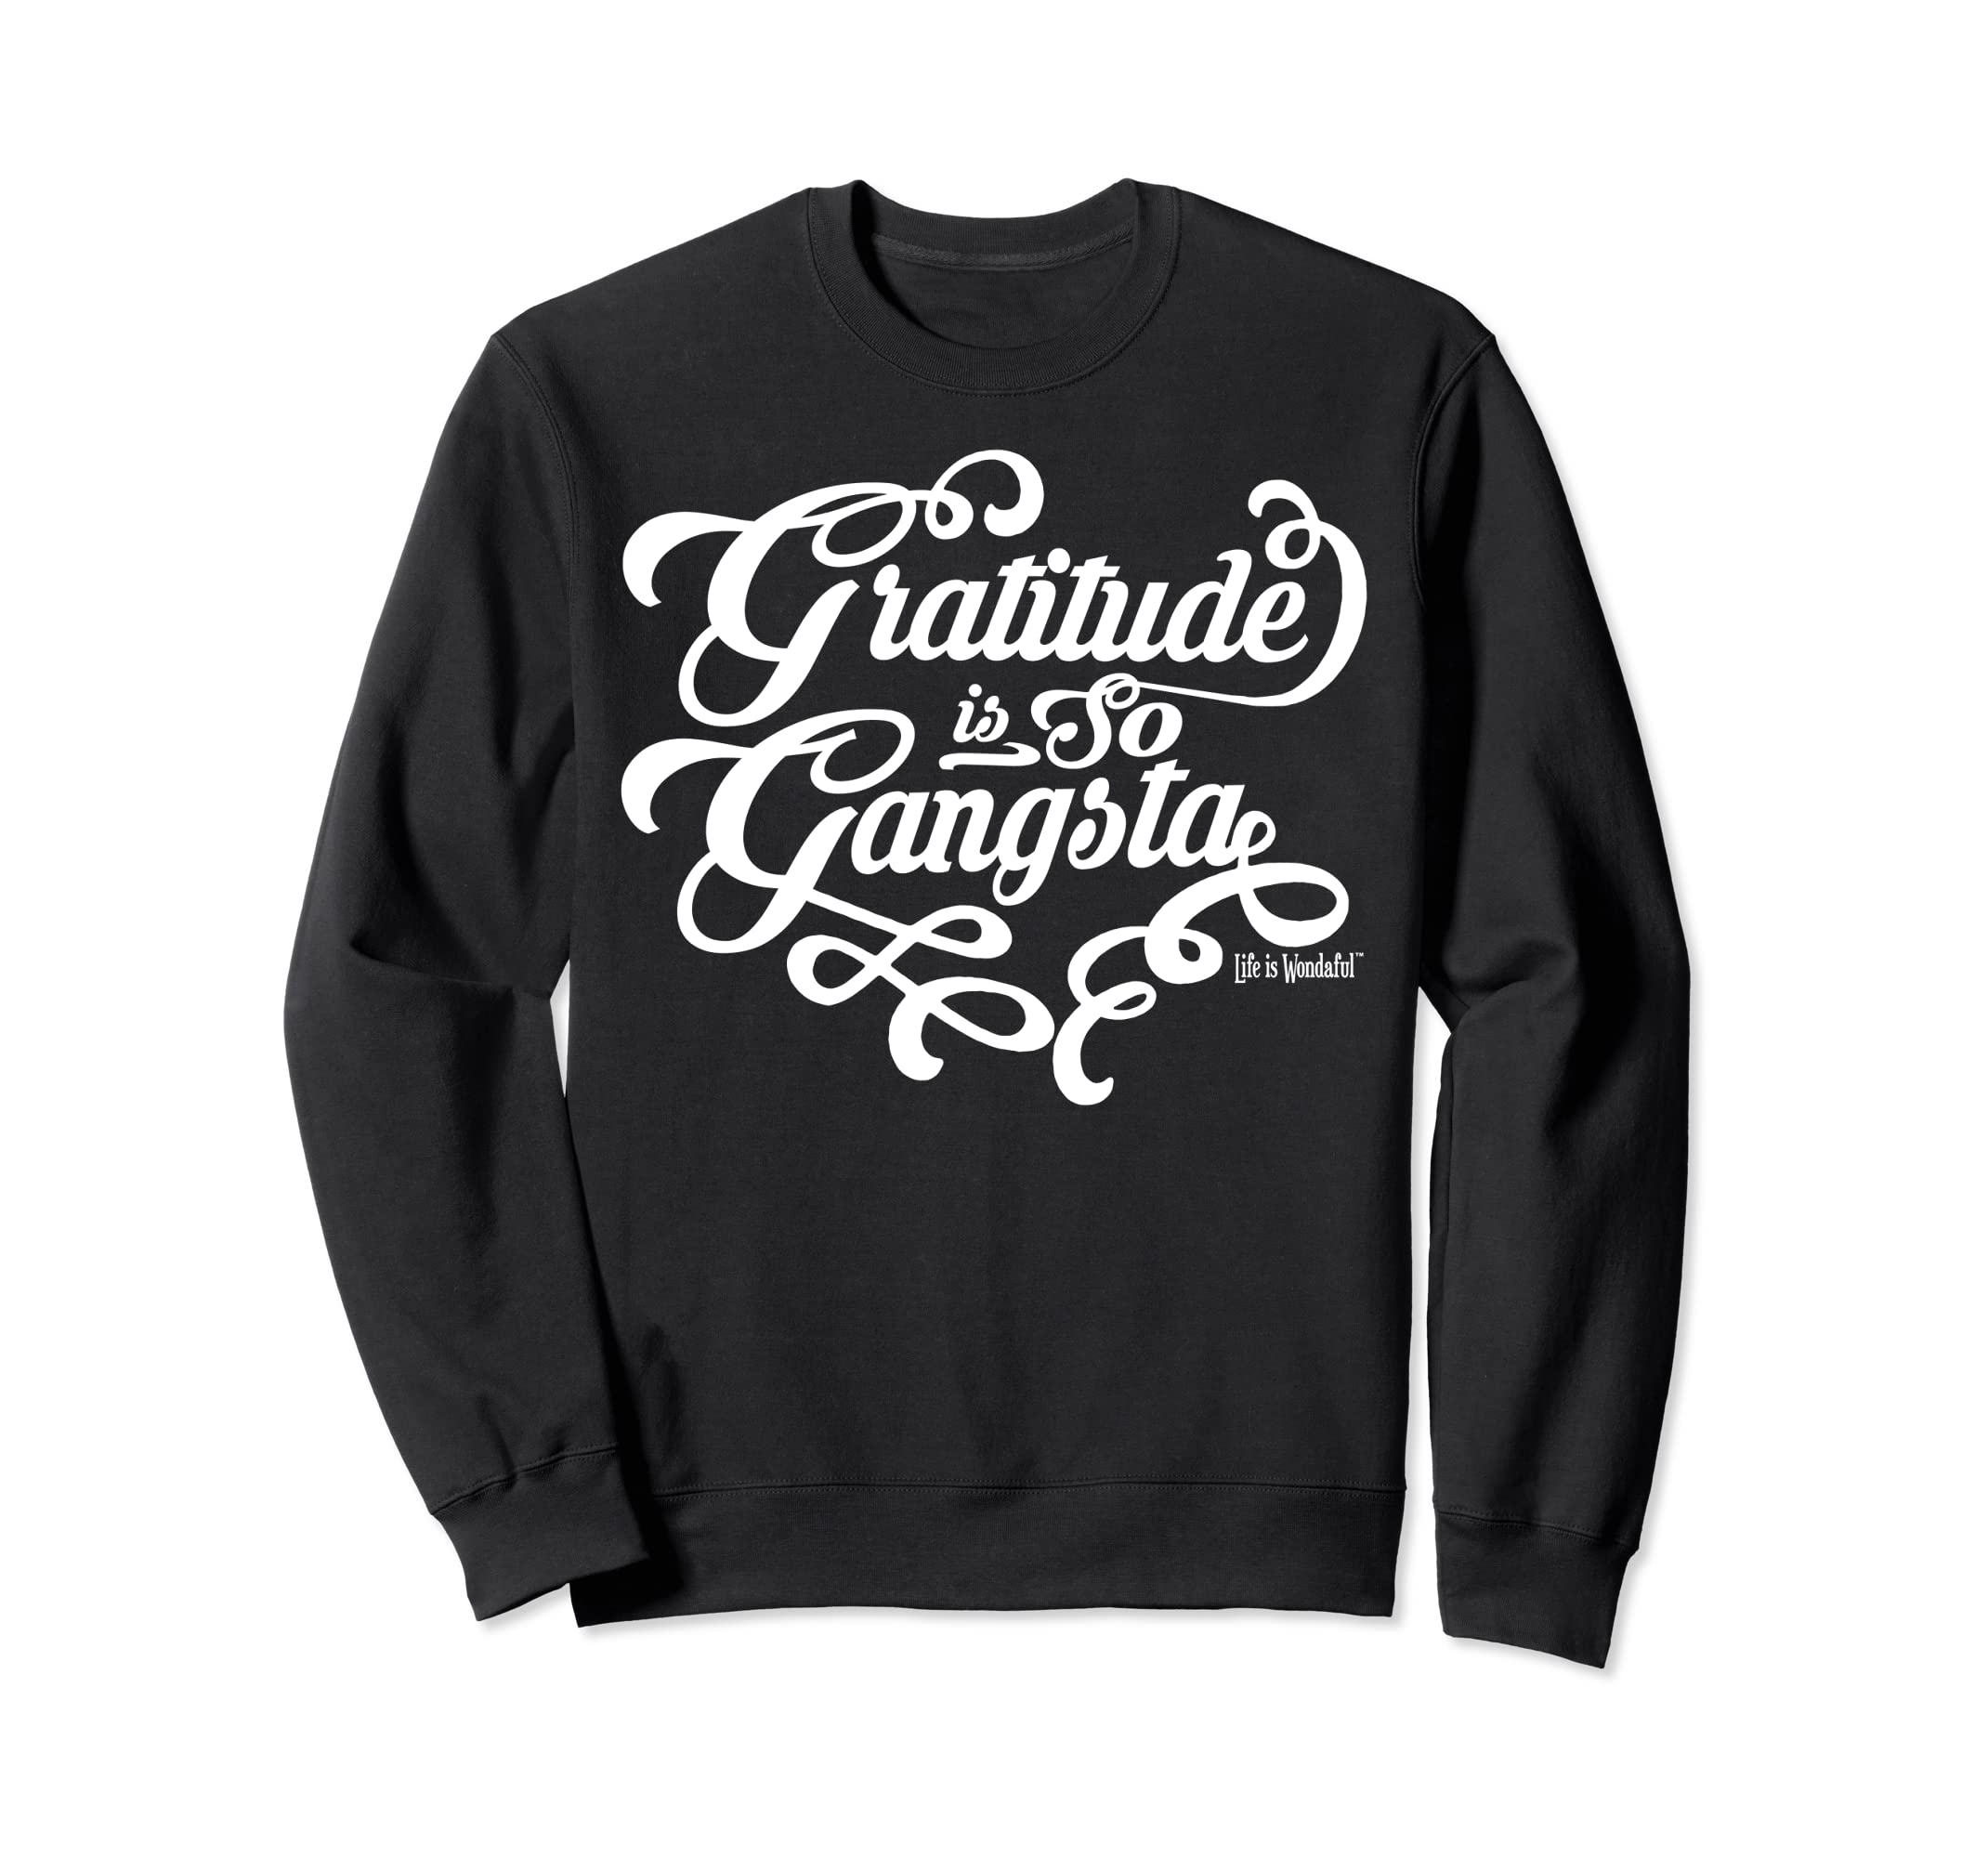 5c93ad5de6c Amazon.com  Gratitude Saying Sweatshirt Gratitude is so Gangsta  Clothing